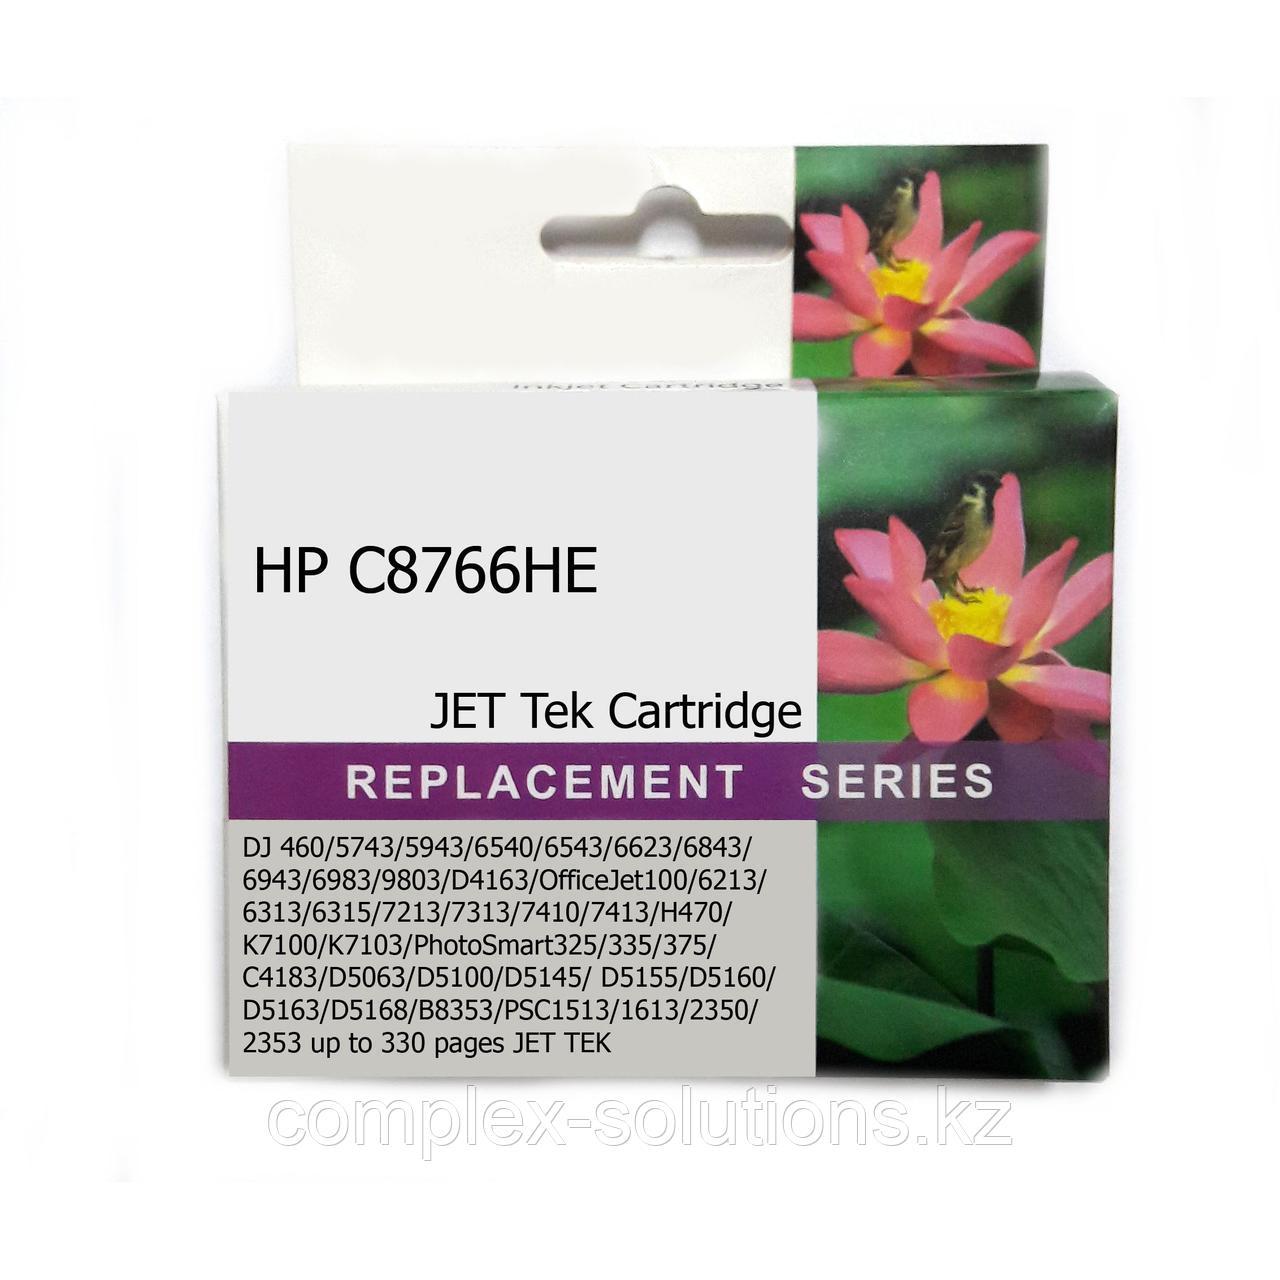 Картридж HP C8766HE Tri-color Inkjet Print Cartridge №135, 7ml, for DJ 460 | 5743 | 5943 | 6540 | 6543 | 6623 | 6843 | 6943 | 6983 | 9803 | D4163 |